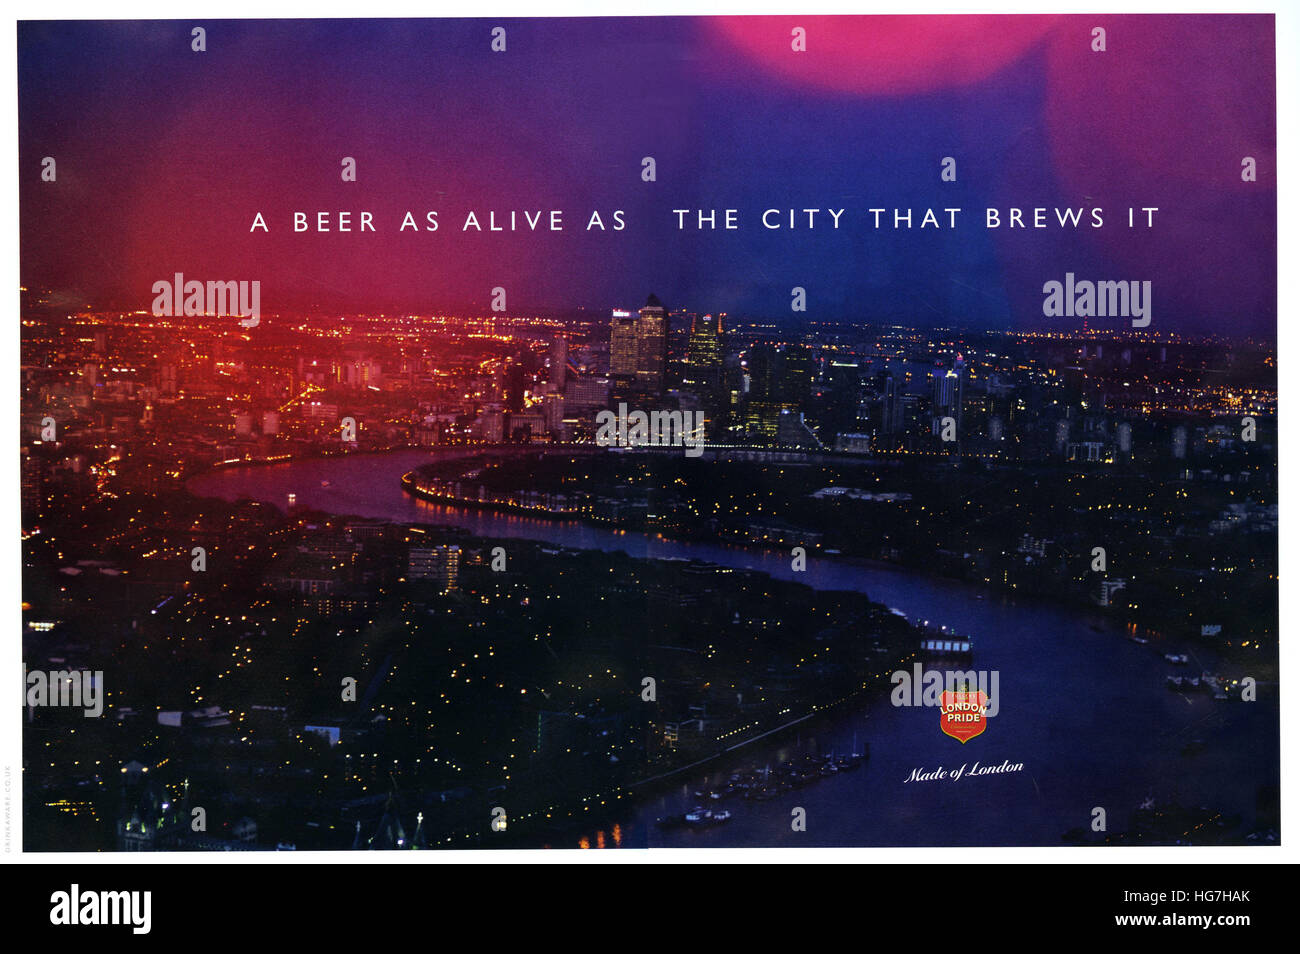 2010s UK London Prise Magazine Advert - Stock Image